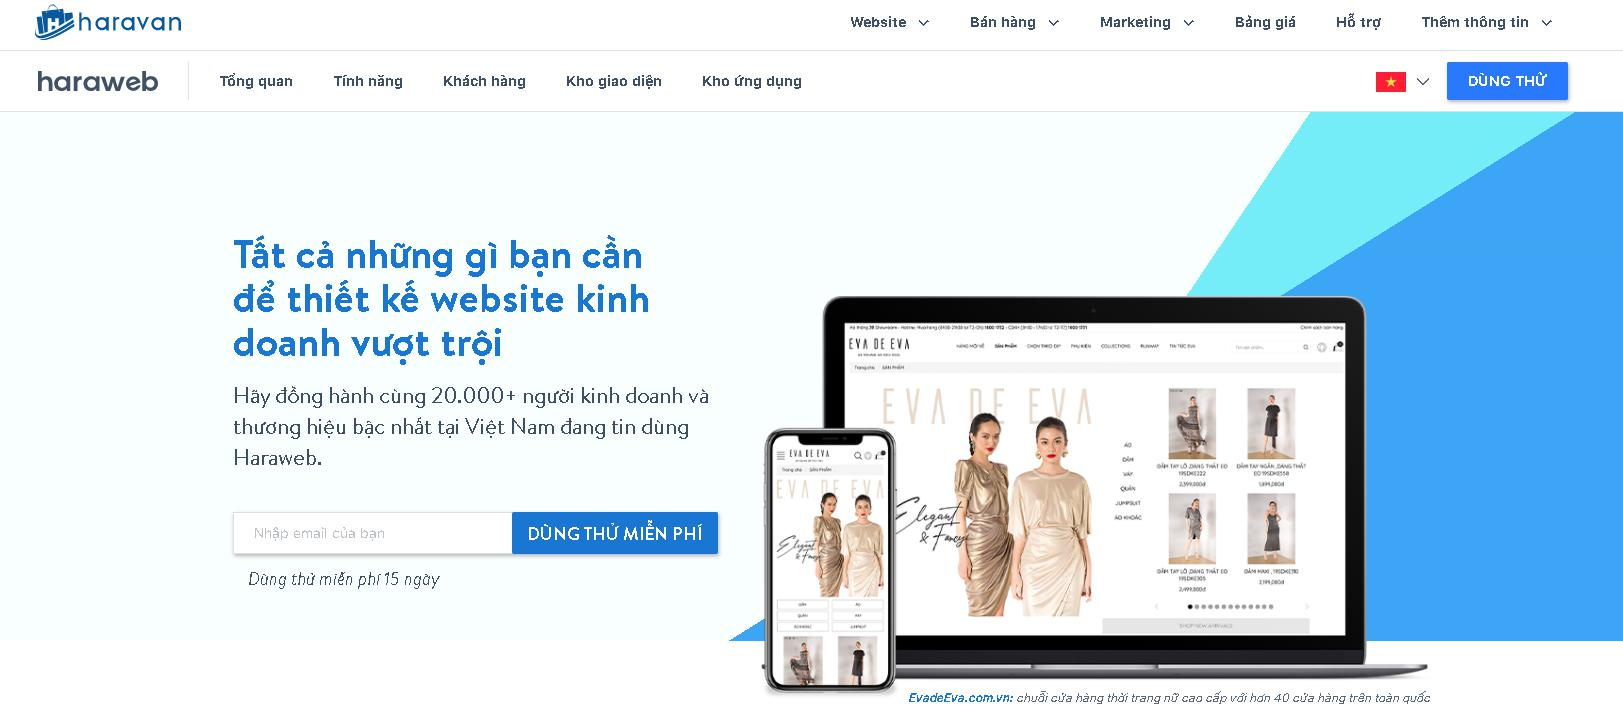 Dịch vụ lập trình website Haravan